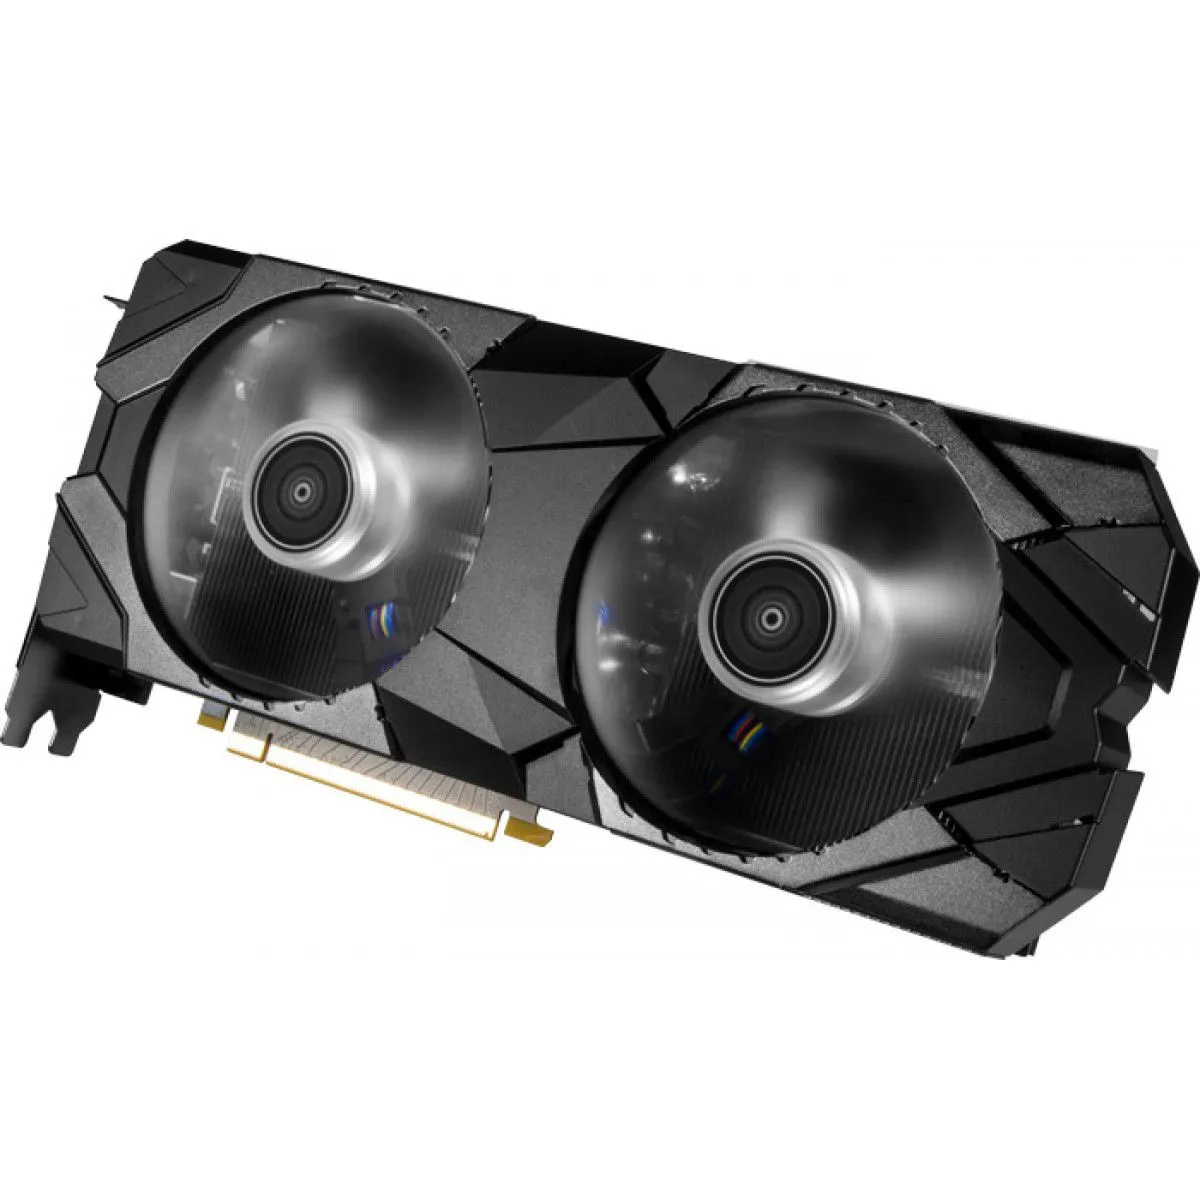 Placa de Vídeo Galax GeForce RTX 2070 Super EX (1-Click OC) 8GB GDDR6 256Bit 27ISL6MDU9EX